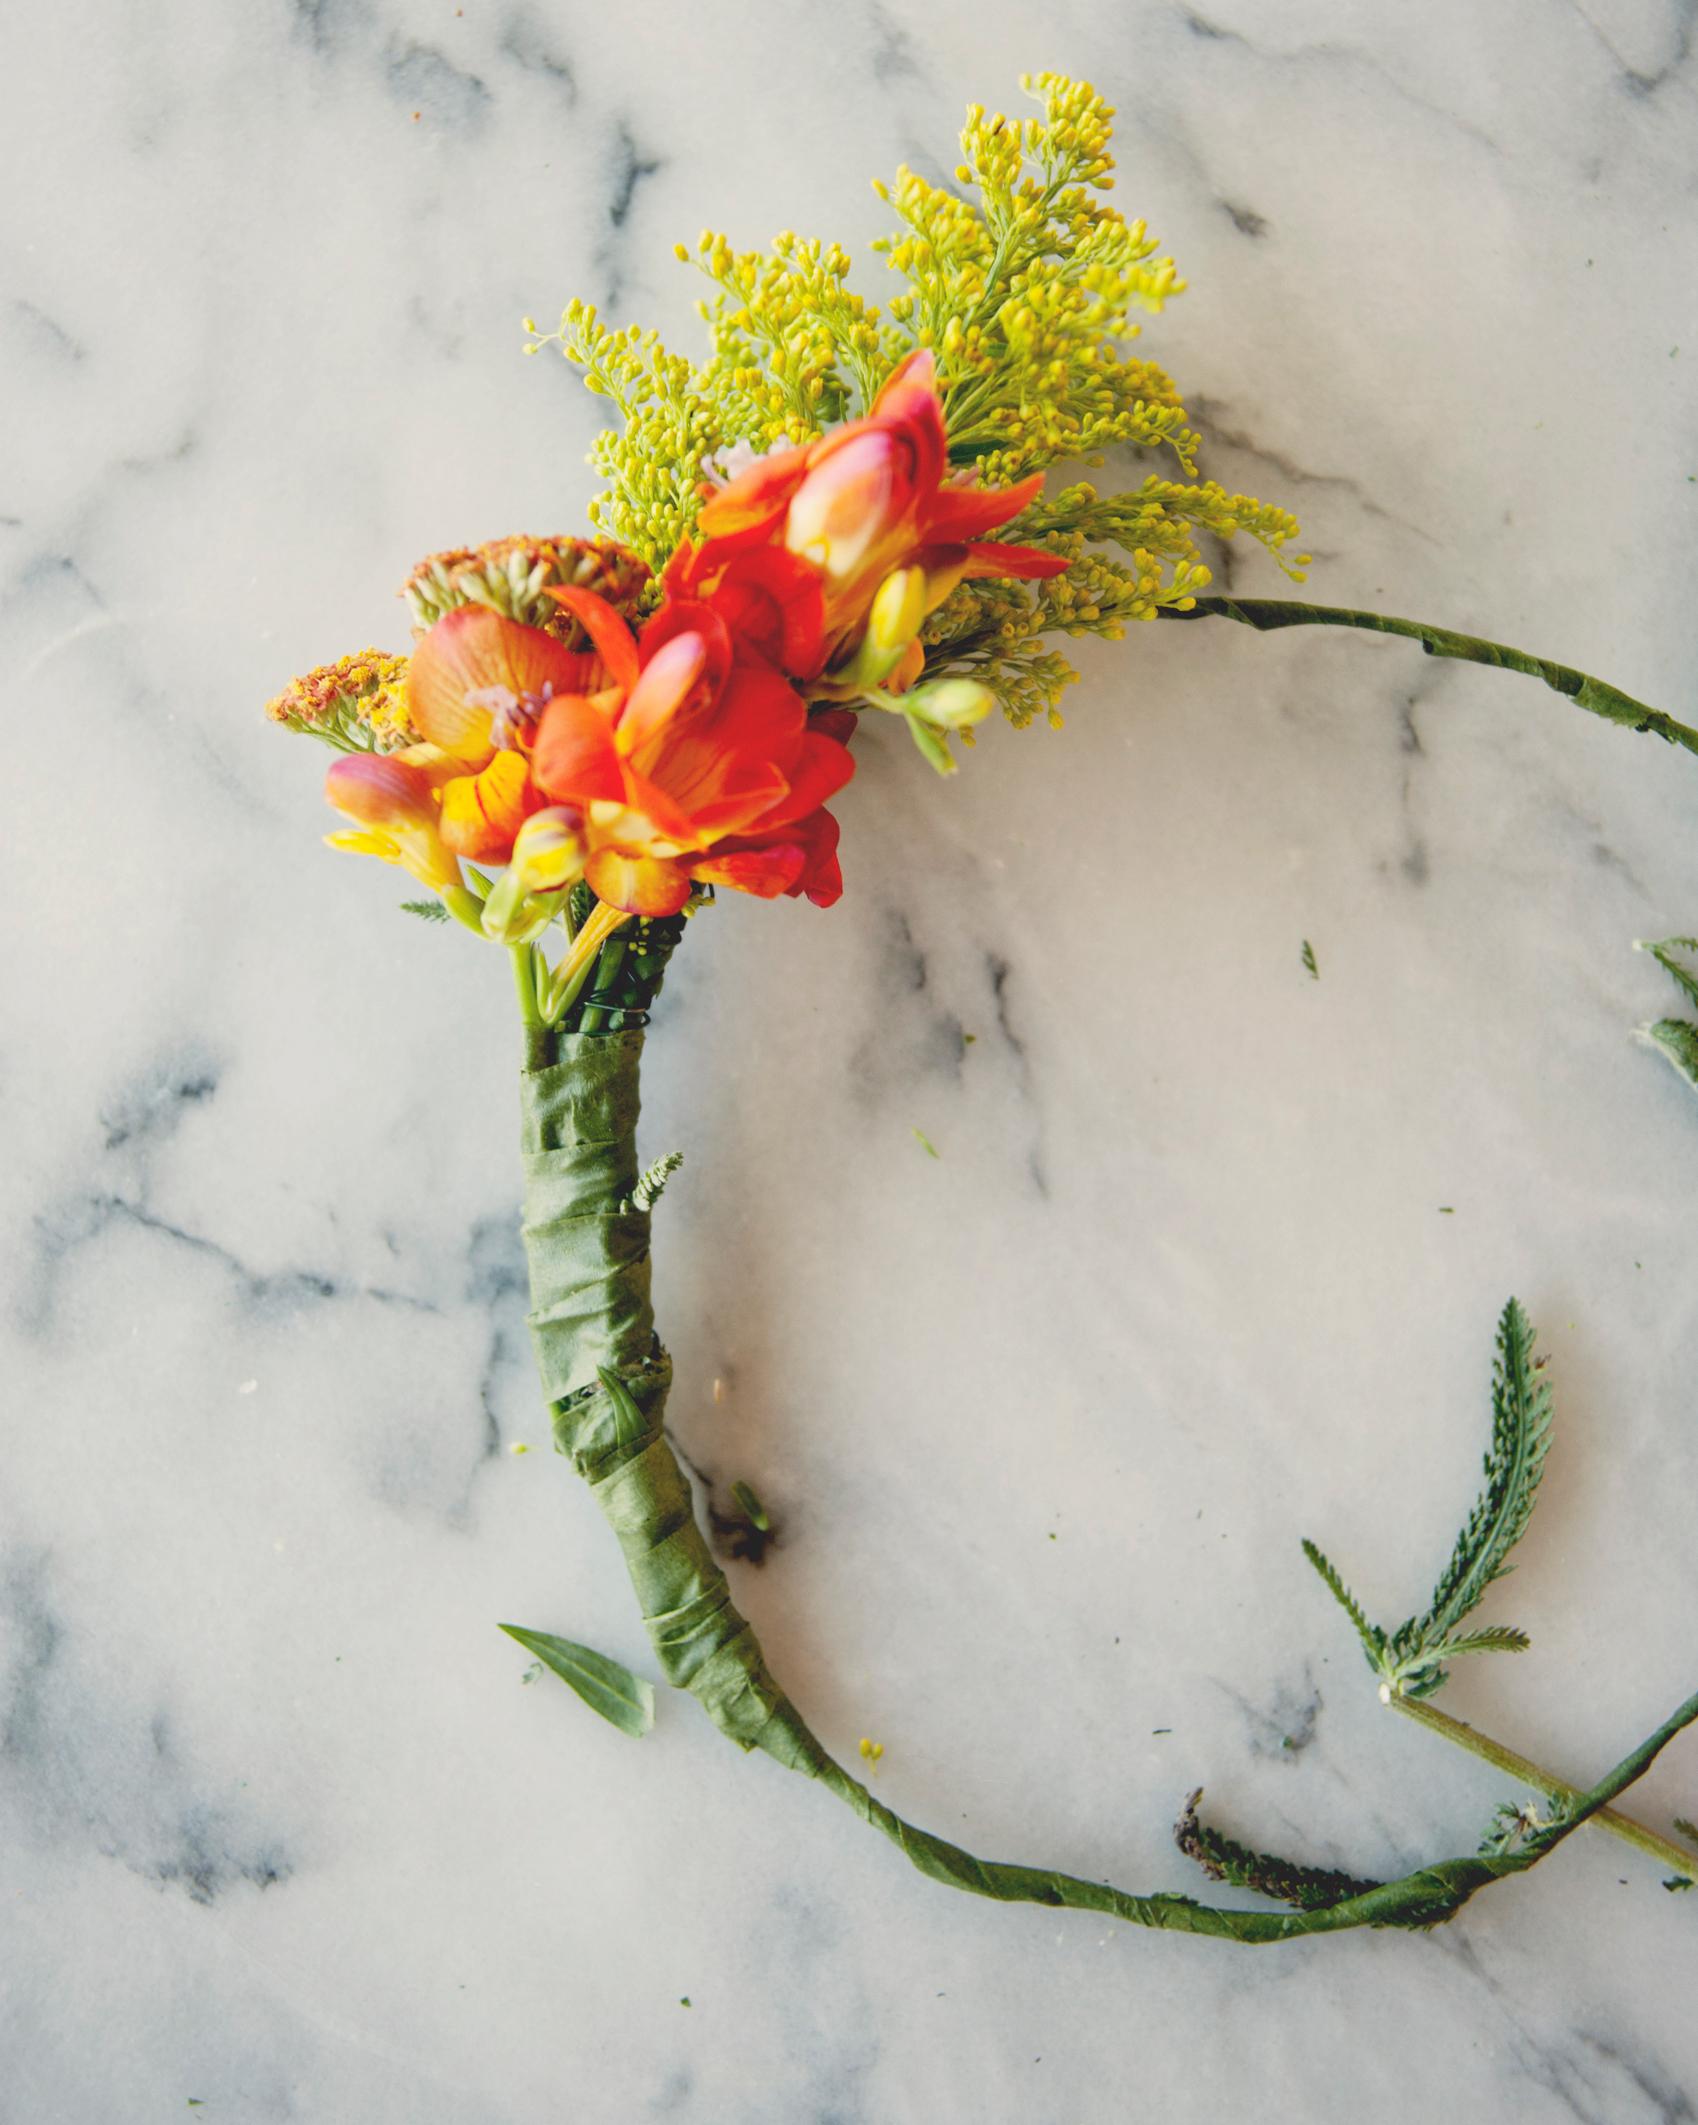 claire-thomas-bridal-shower-boho-diy-flowers-wrapped2-0814.jpg